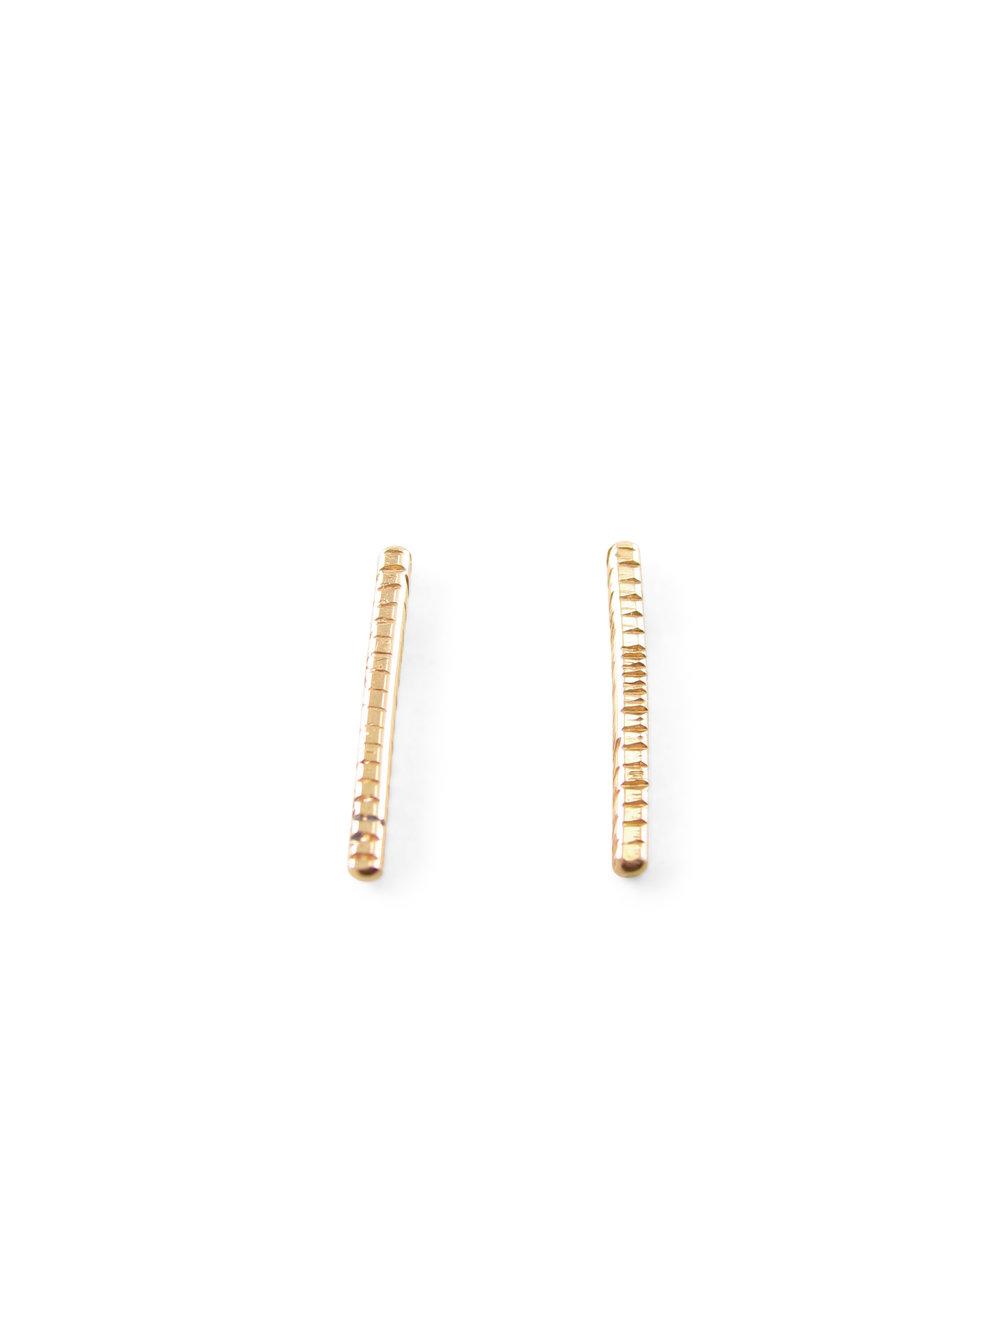 EXTRA SHORT GOLDEN STEM EARRINGS RECYCLED 14K GOLD Sharon Z Jewelry